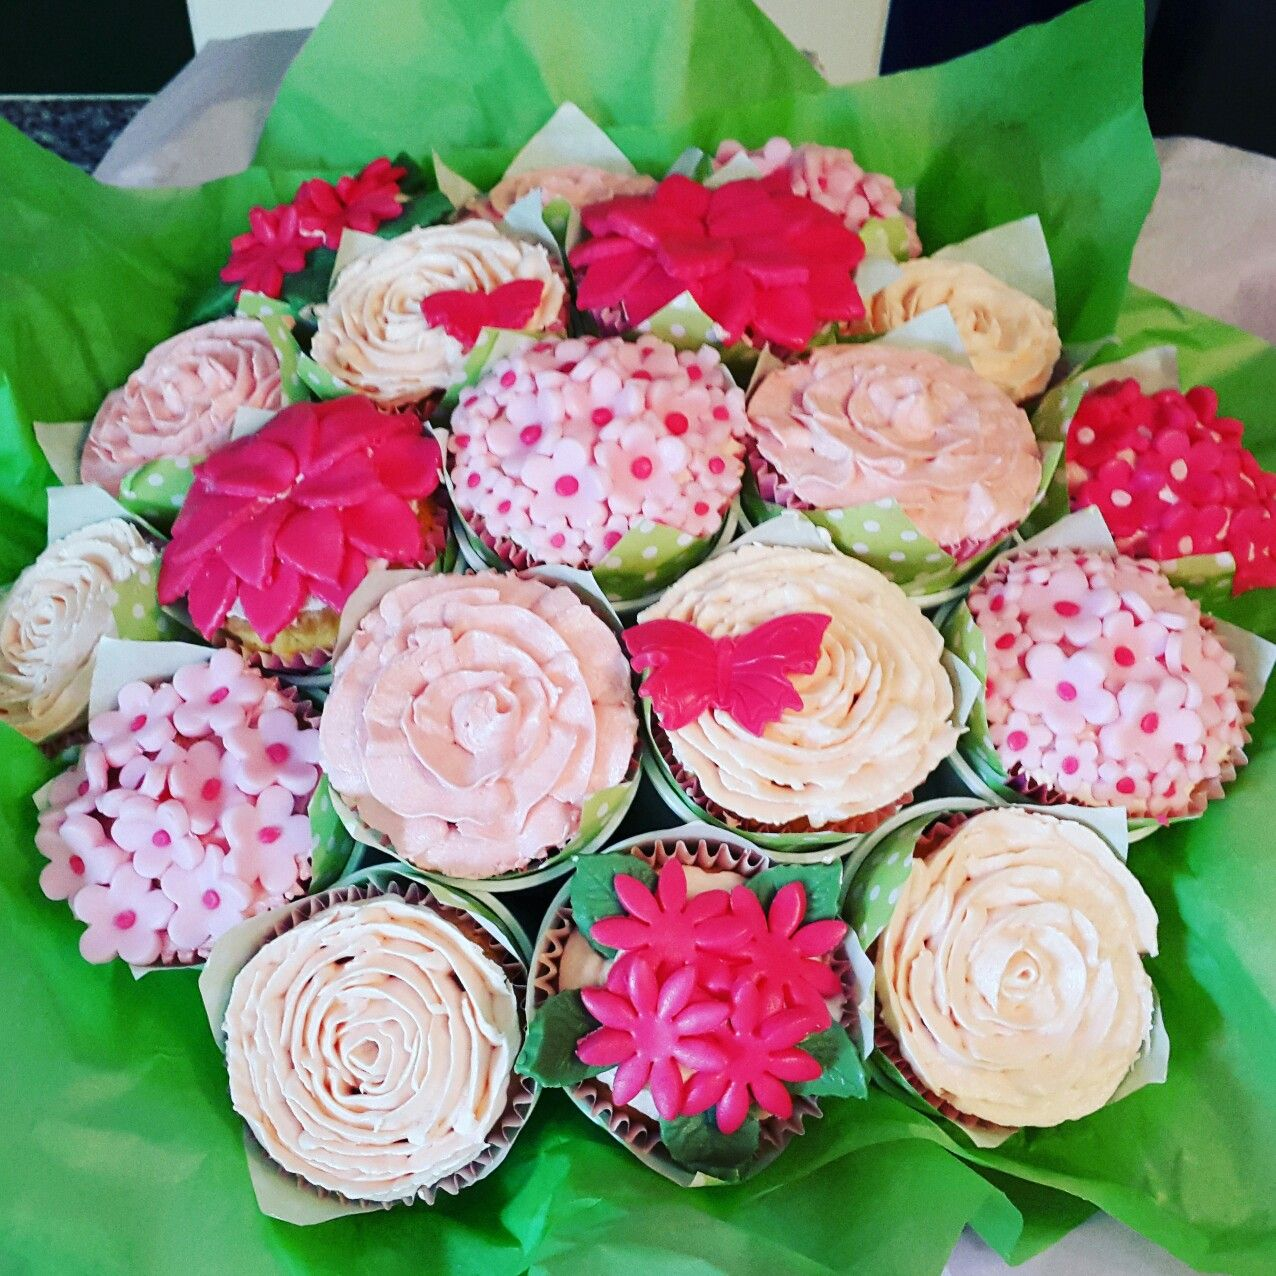 Cupcake flower bouquet   My Cakes   Pinterest   Cupcake flower ...